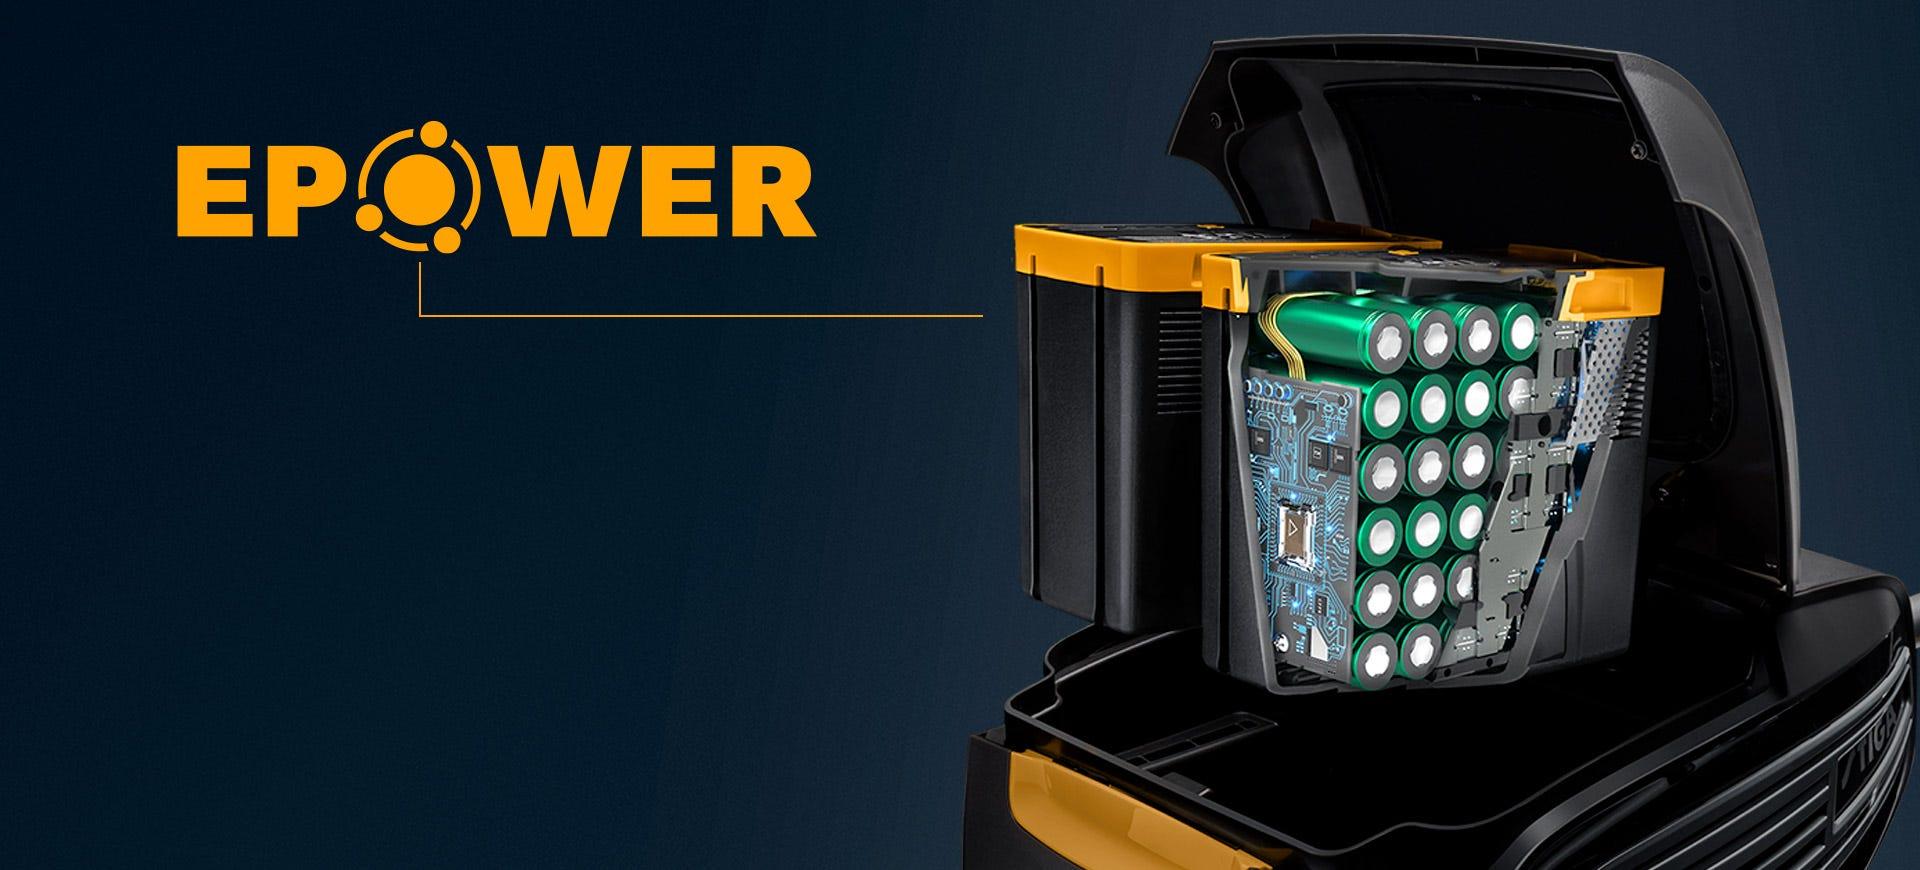 Nueva E-Power de STIGA